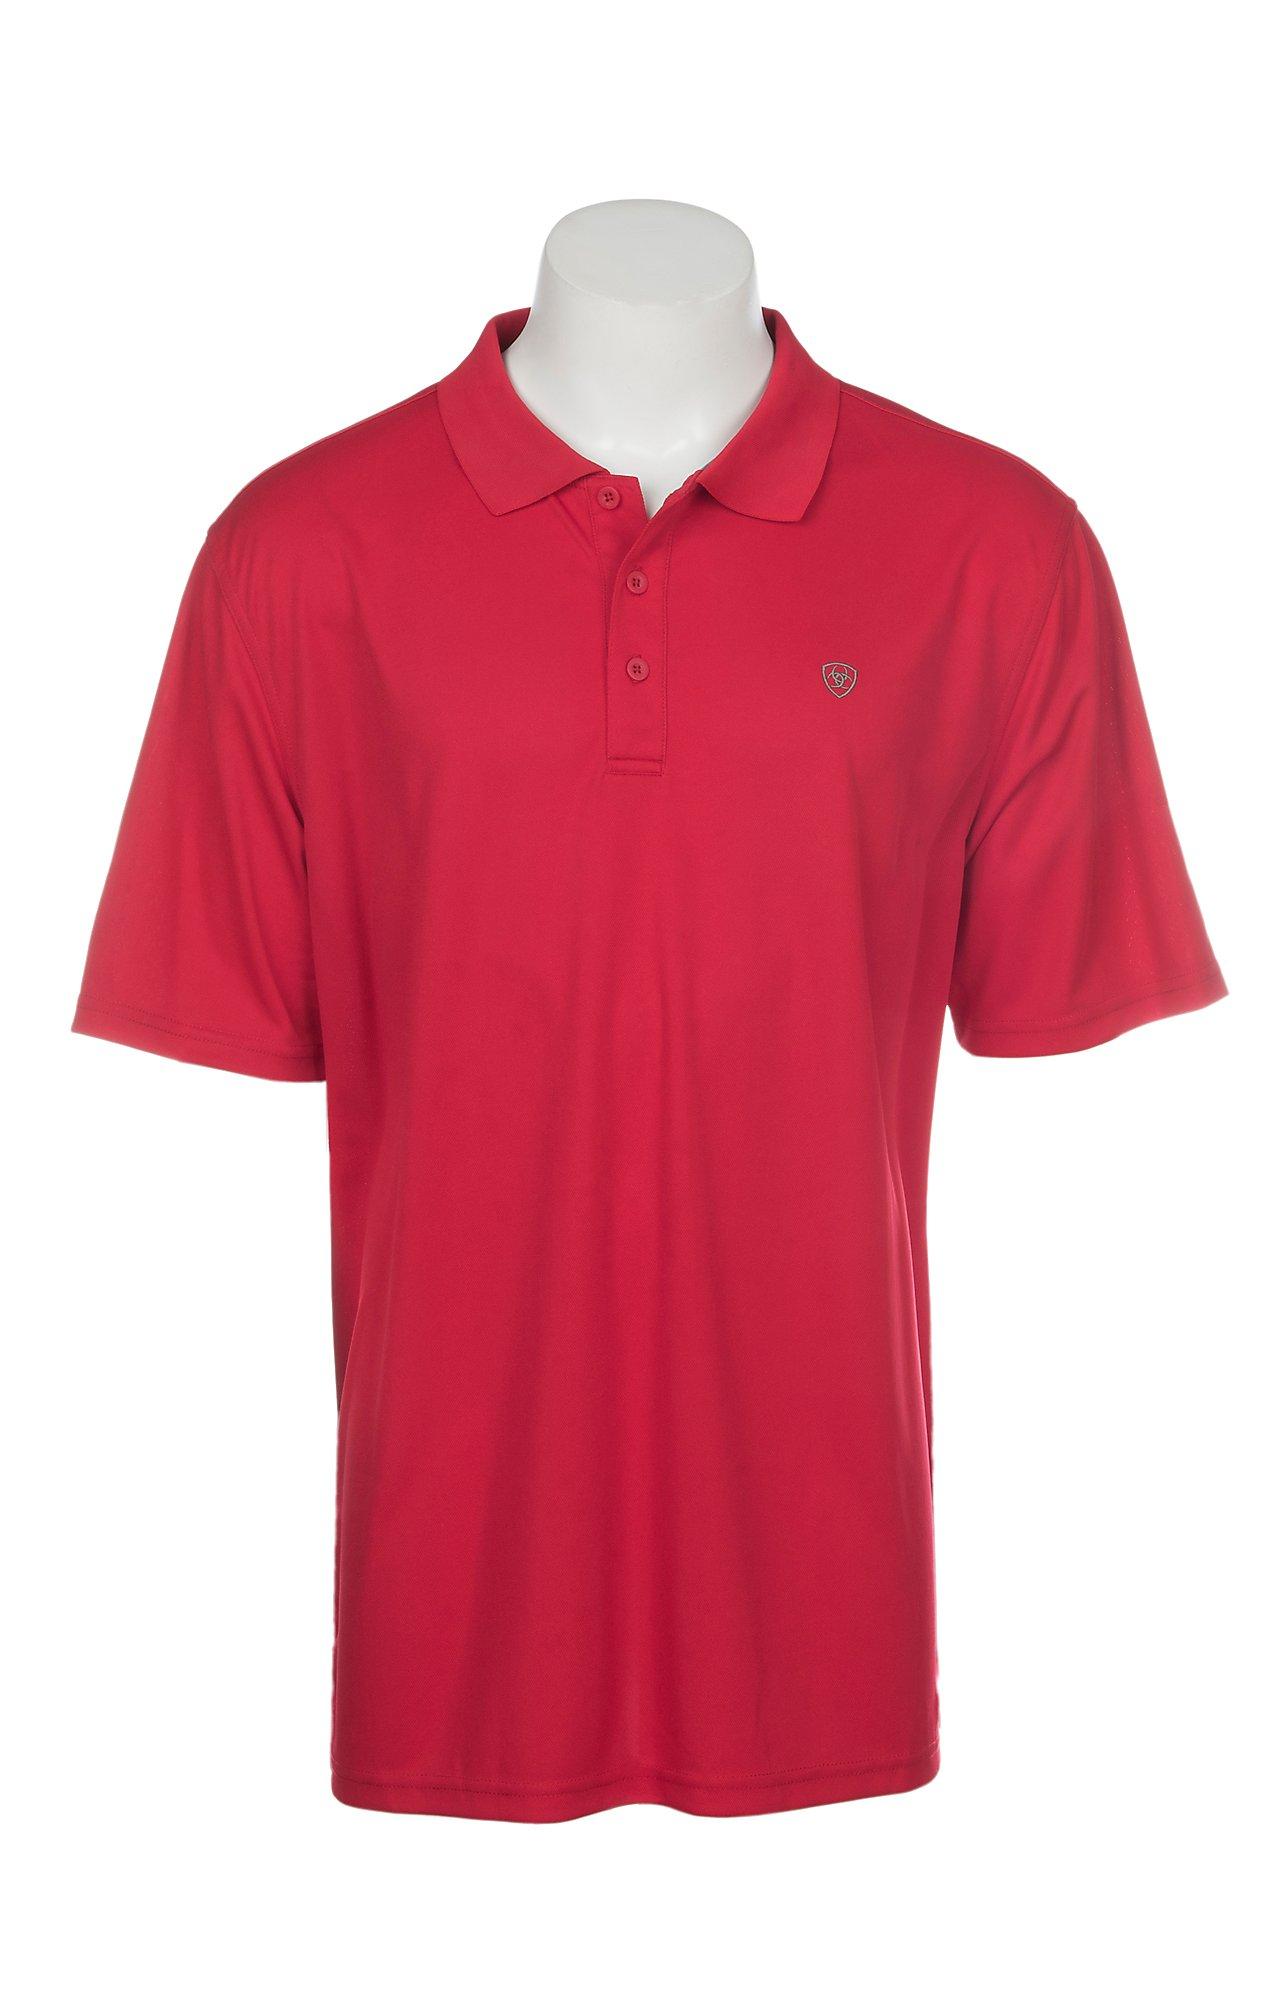 Ariat Mens Crimson Flame Heat Series Tek Polo Shirt Cavenders